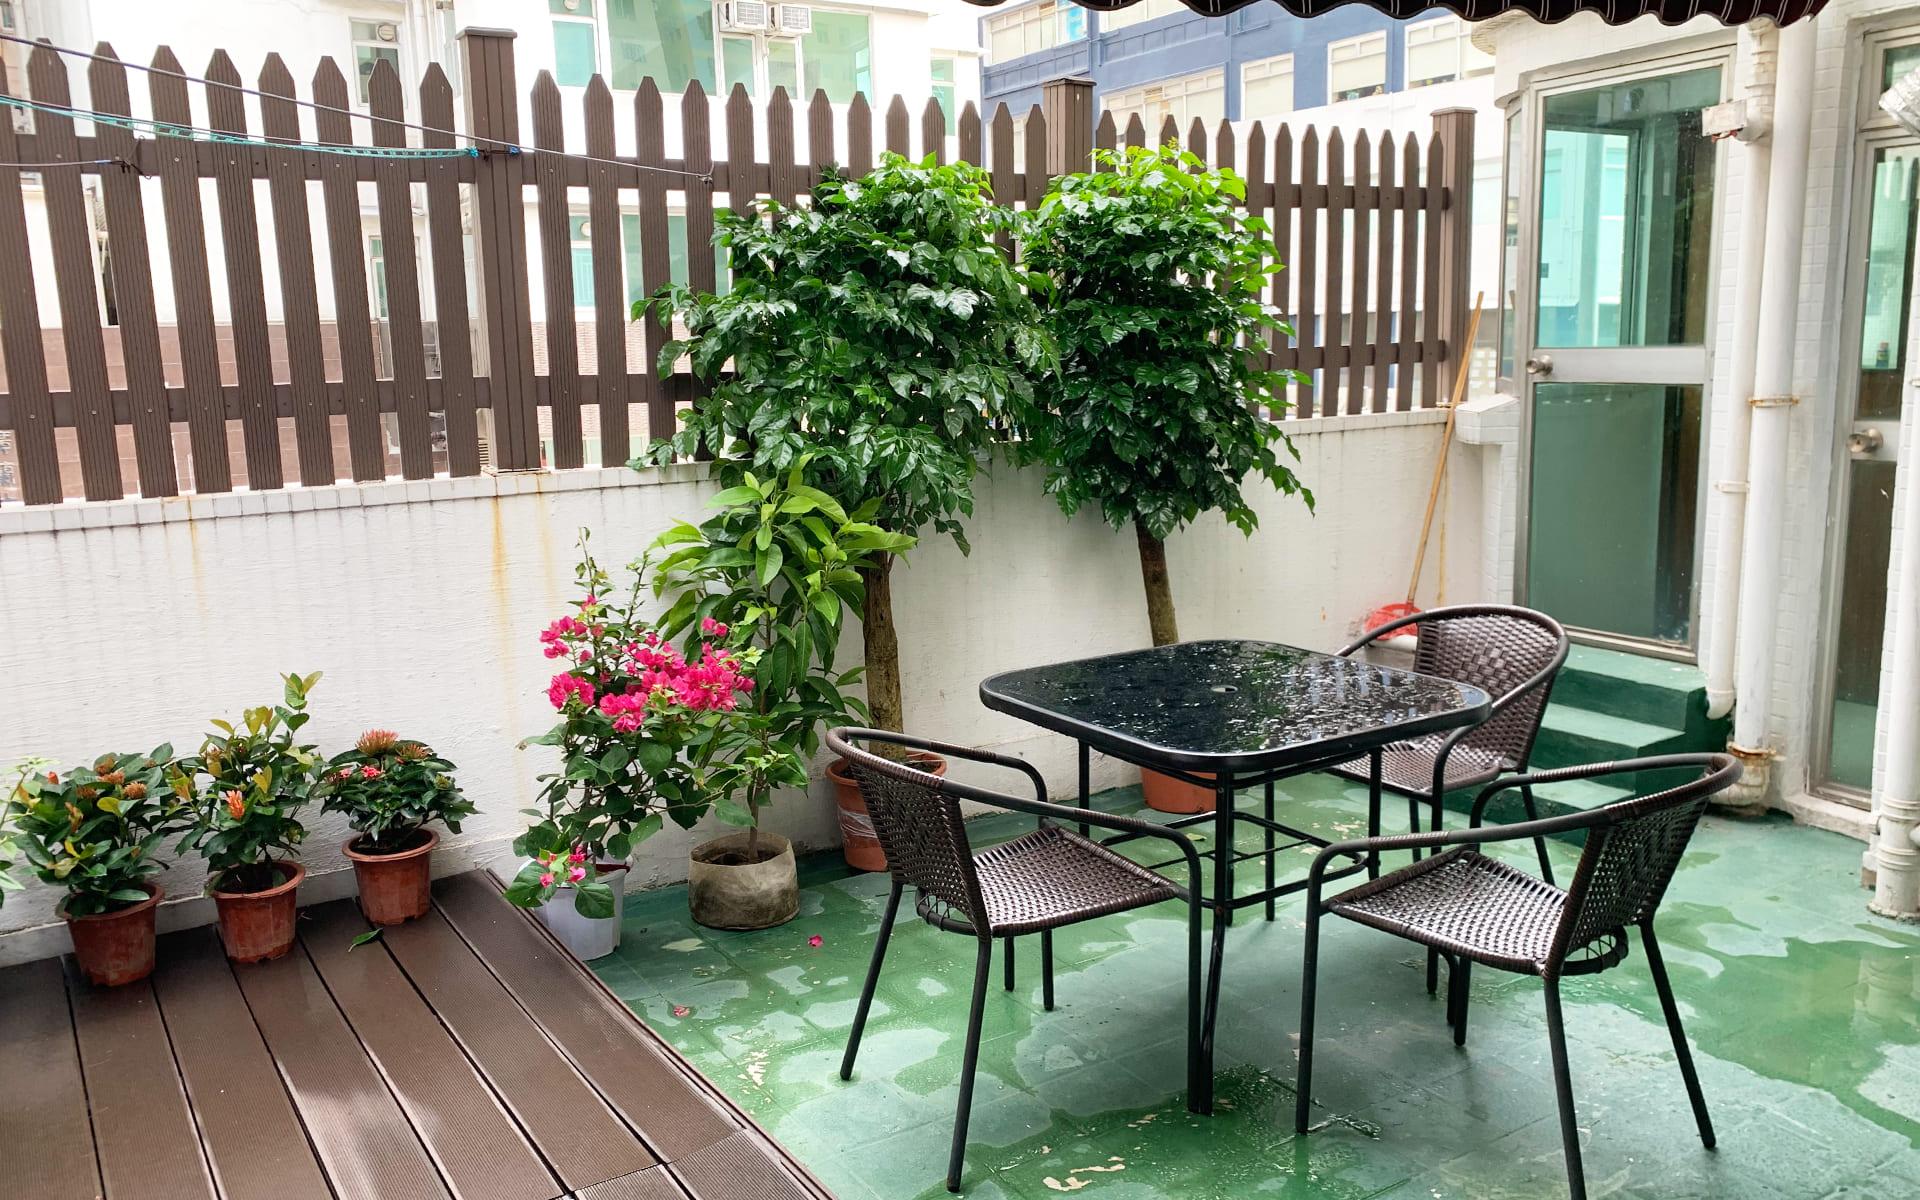 hk_service_apartment_16700584241629432910.jpg